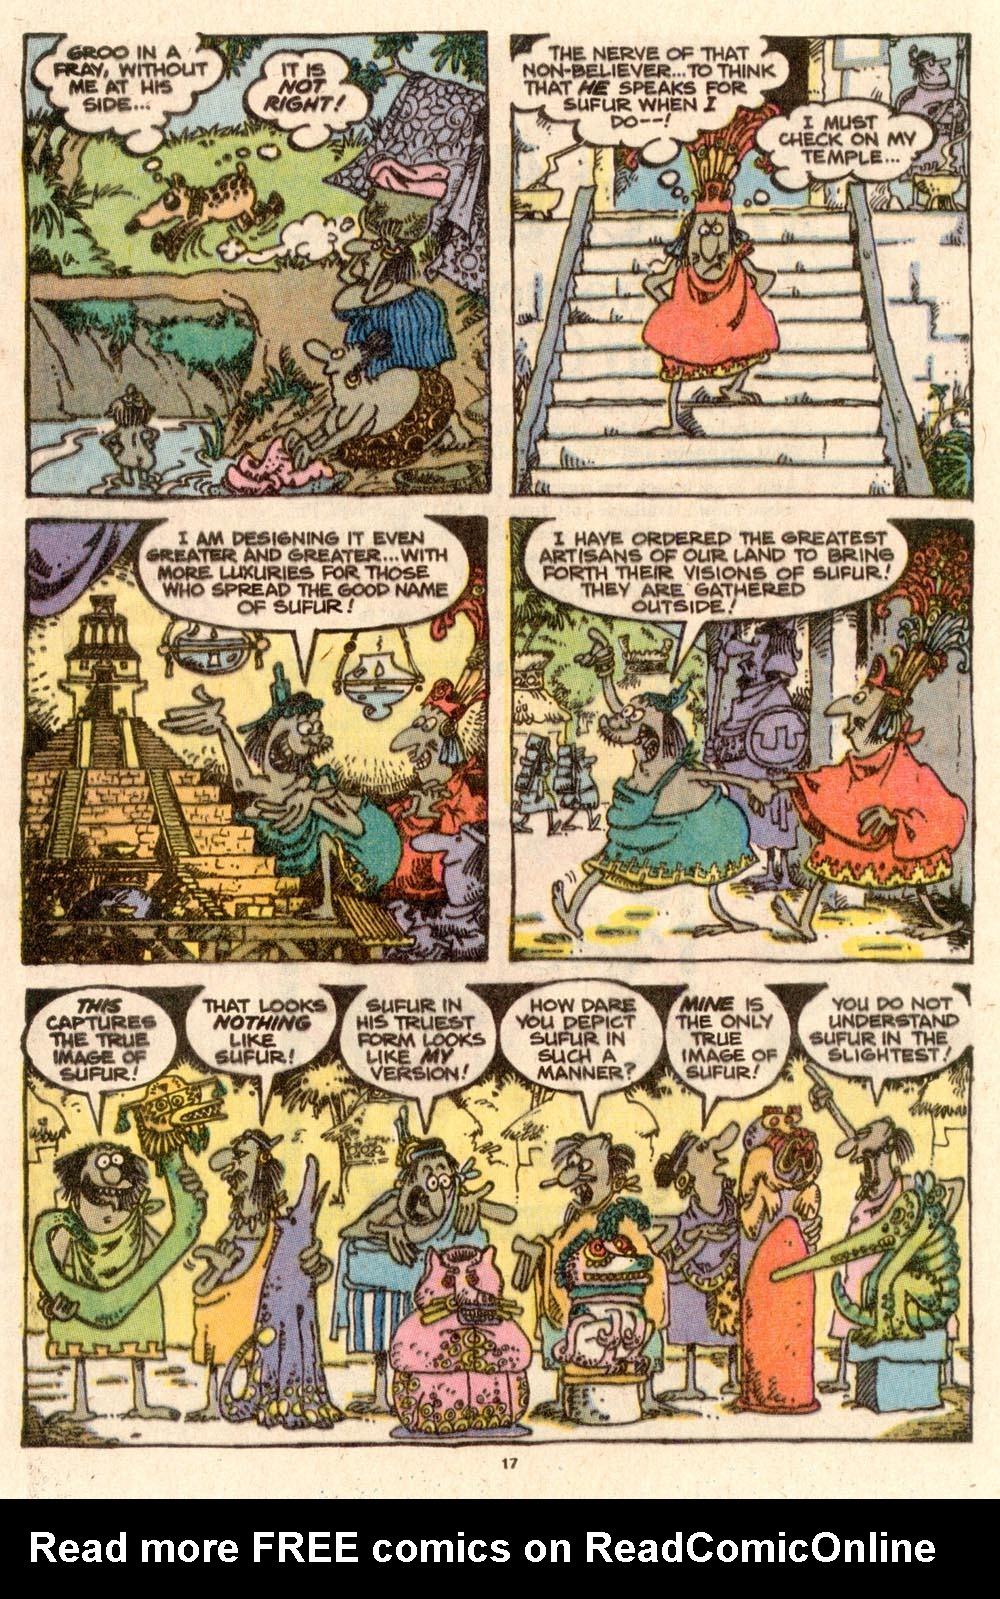 Read online Sergio Aragonés Groo the Wanderer comic -  Issue #58 - 17